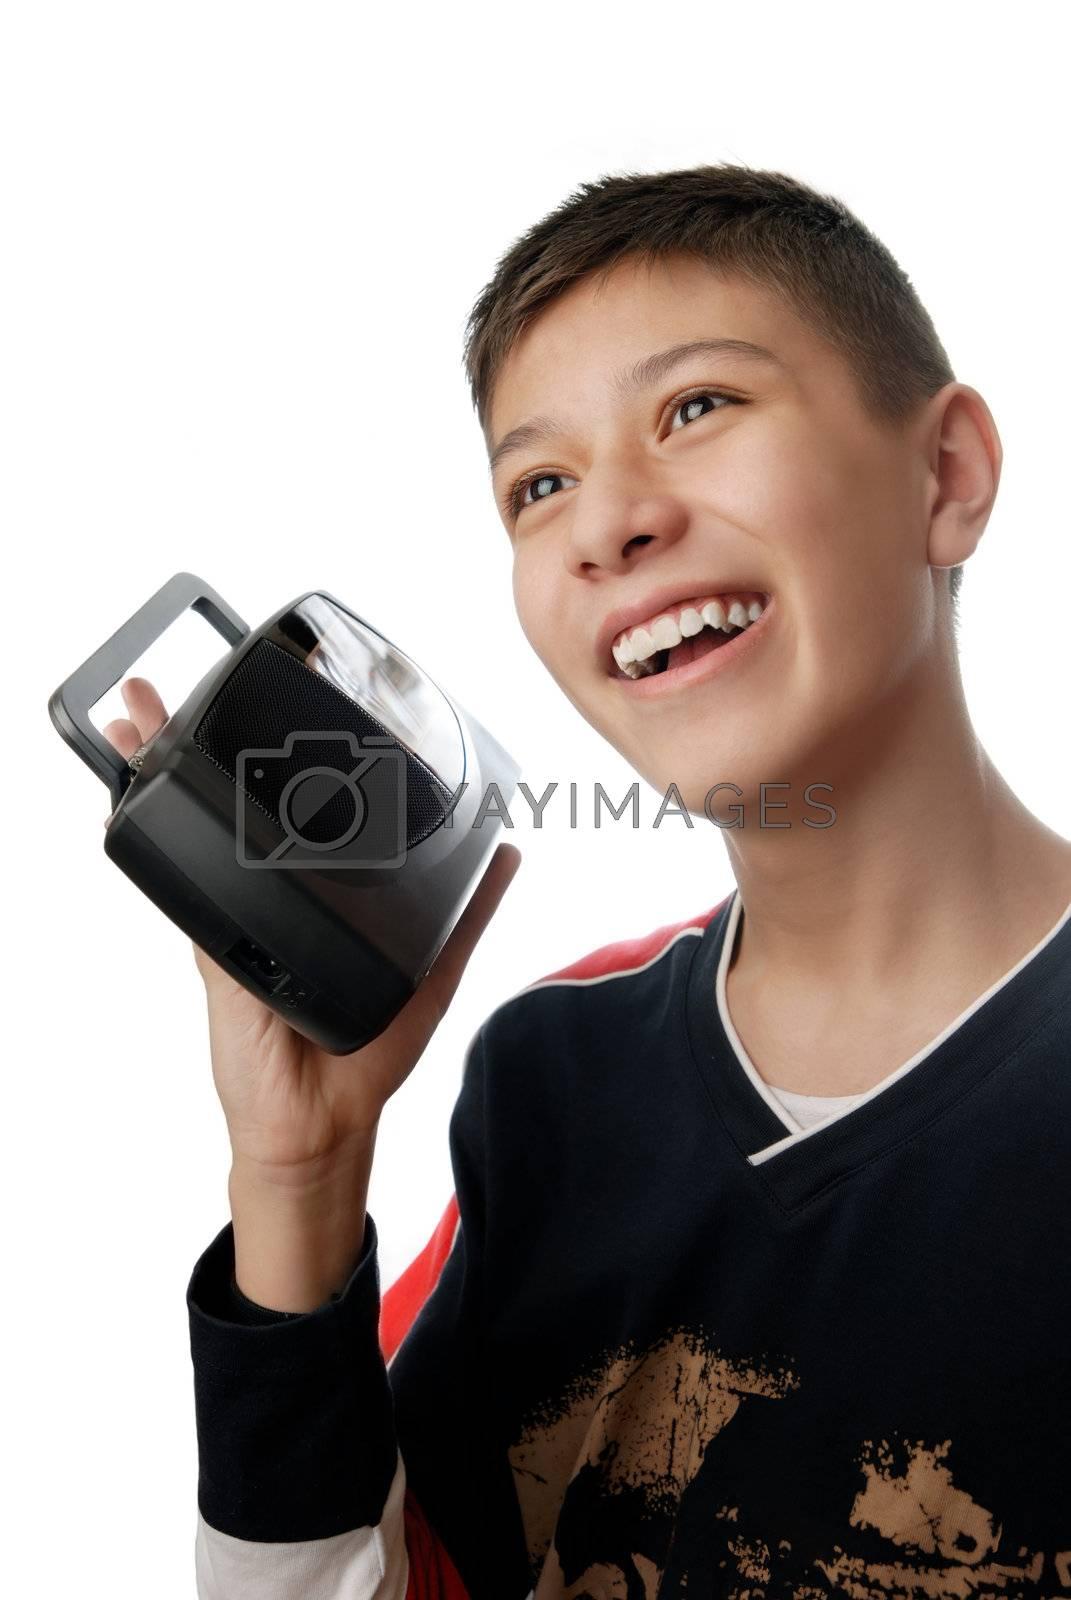 Funny photo of the boy with radio reciever